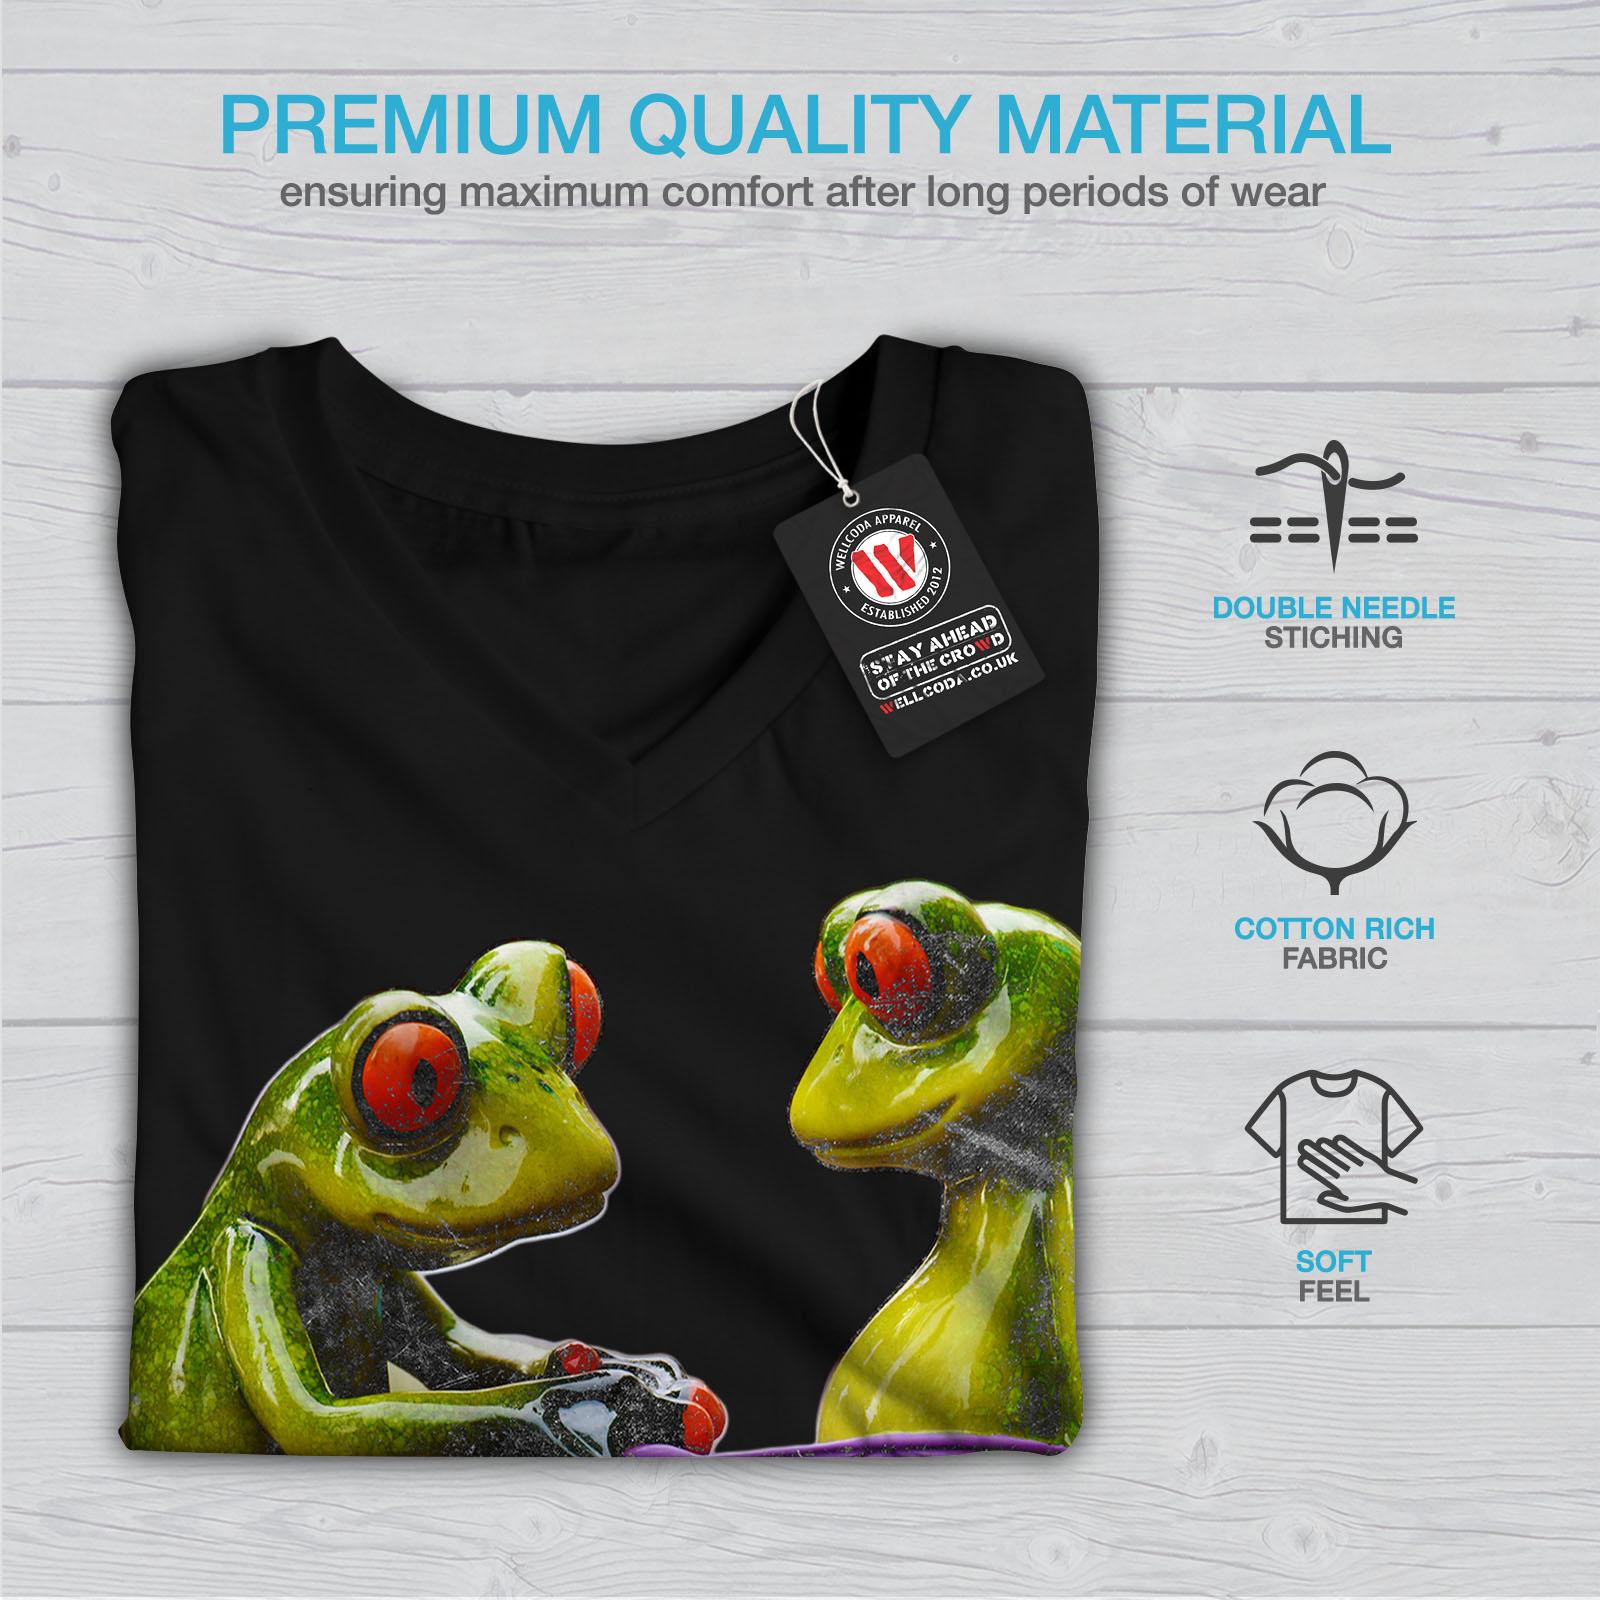 Wellcoda-RANE-Cool-scherzo-da-Donna-V-Neck-T-shirt-Biancheria-Intima-Design-Grafico-Tee miniatura 5